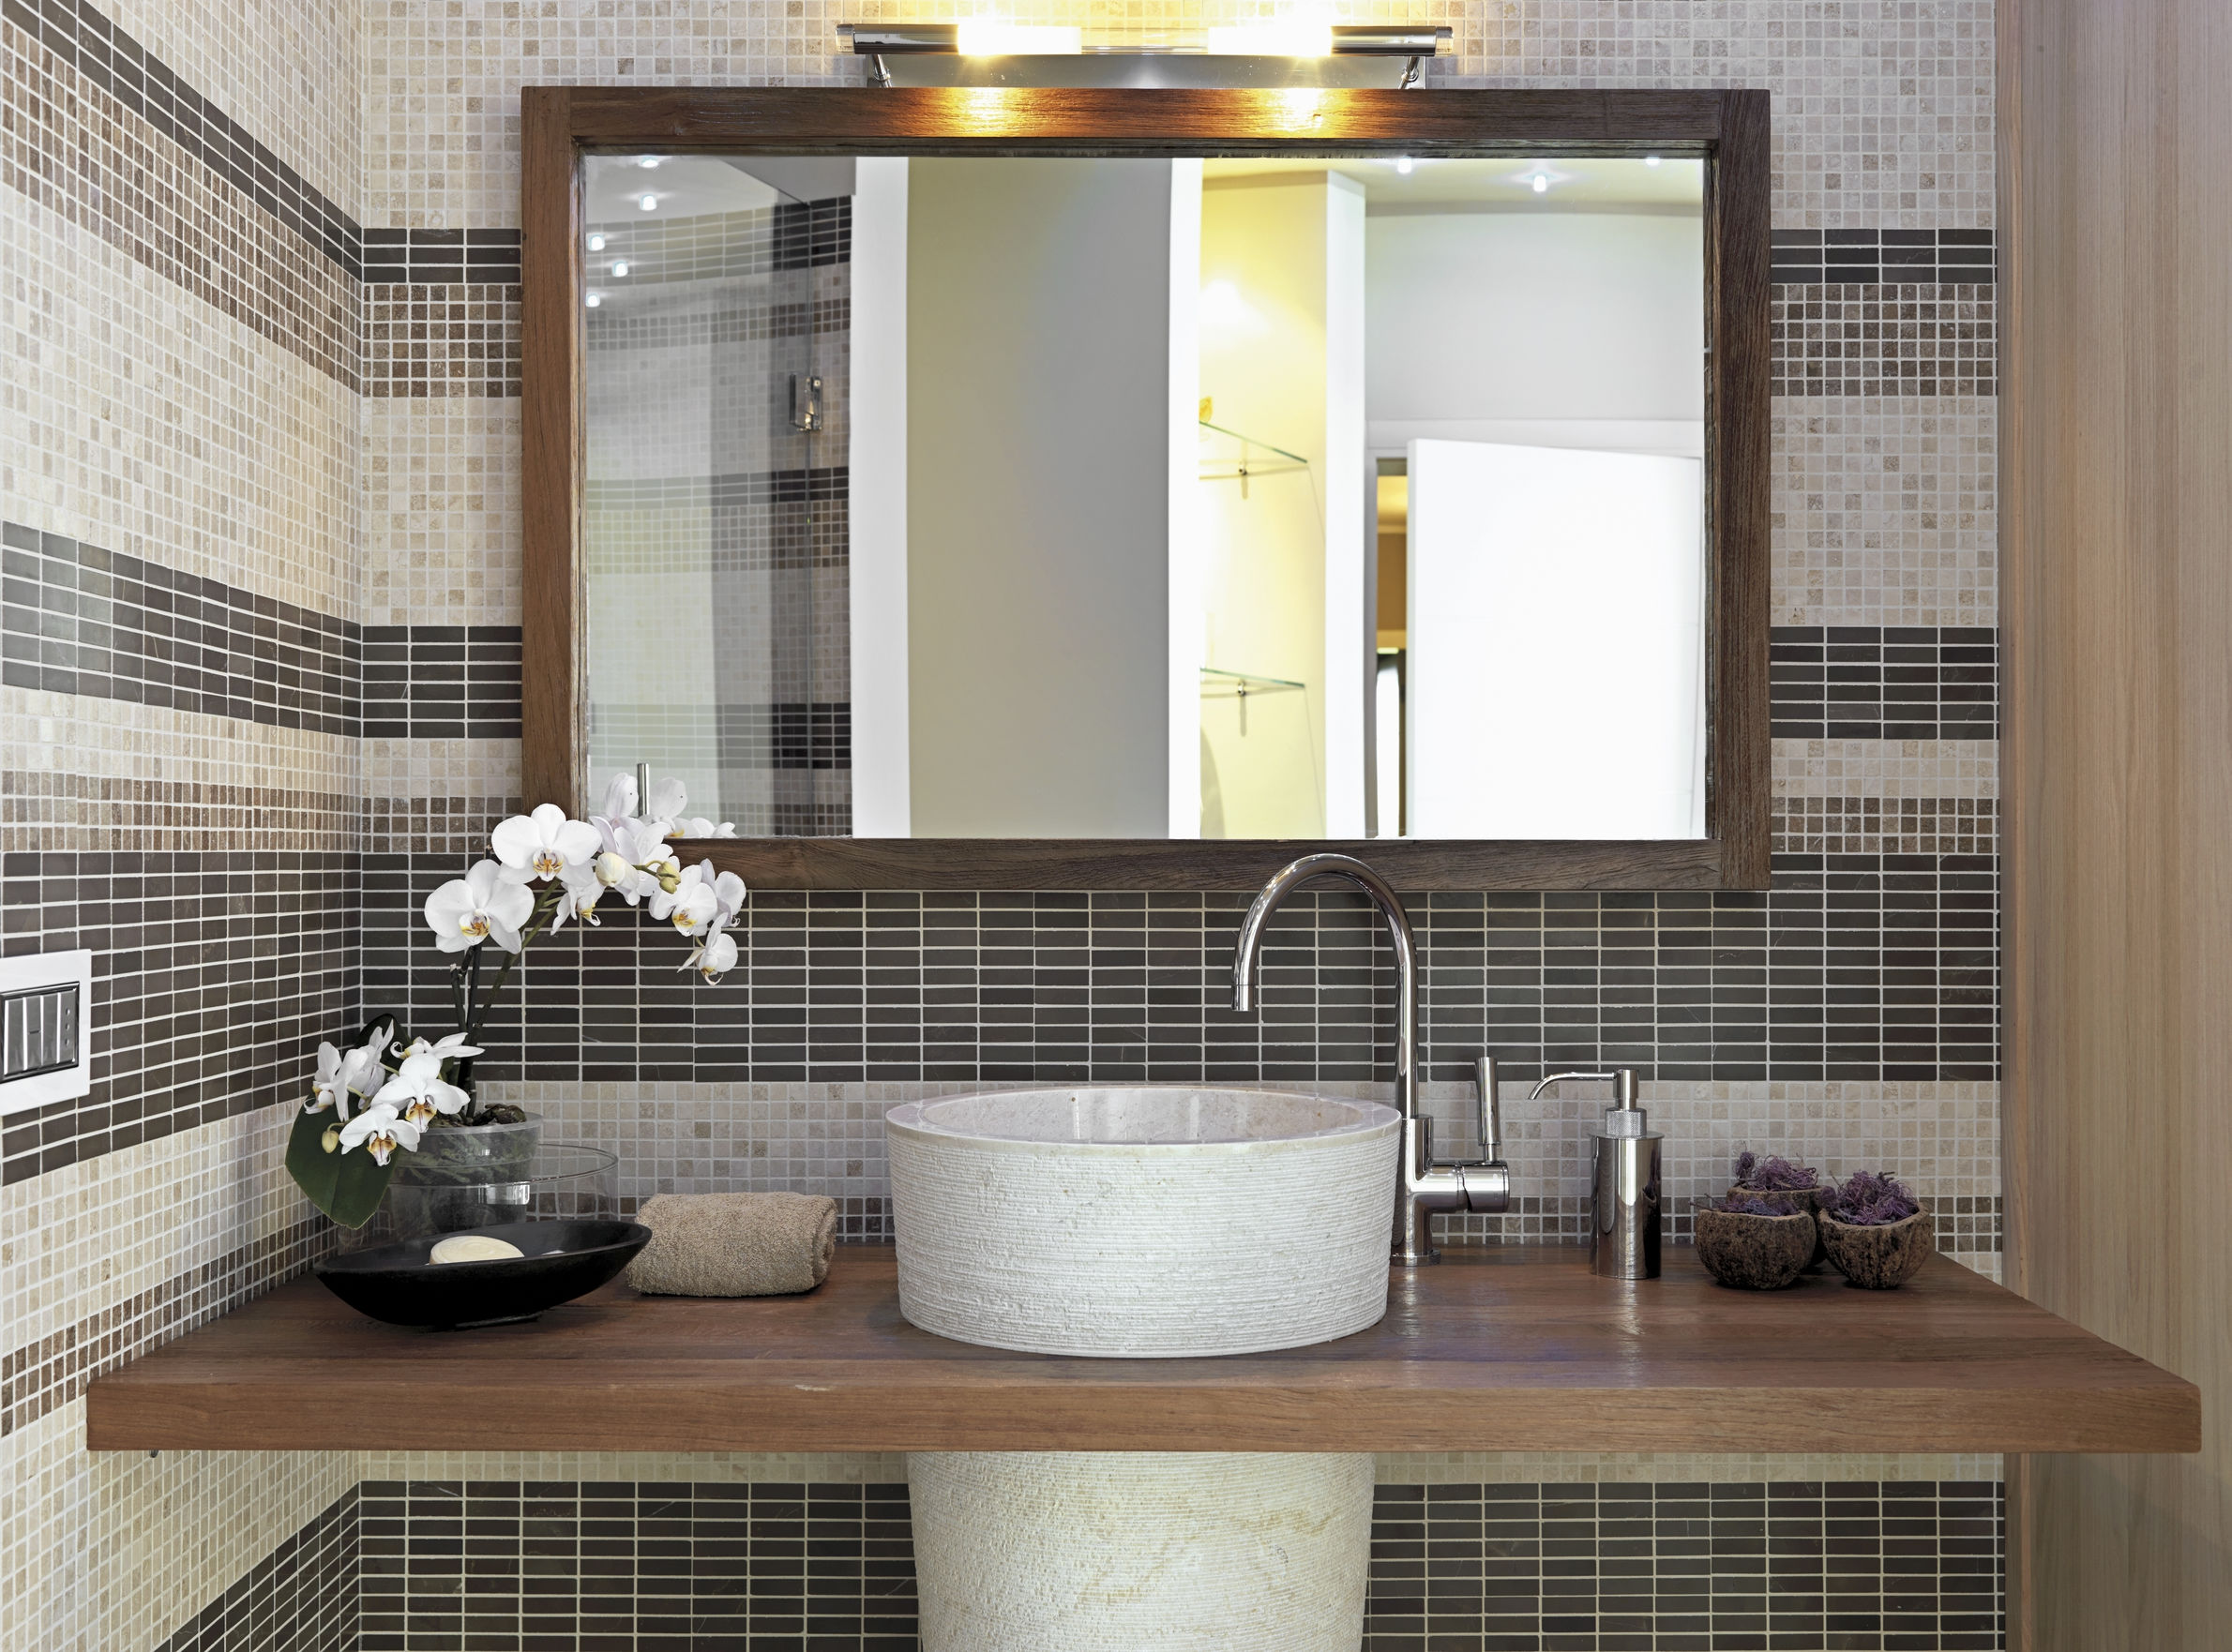 new bahtroom designs